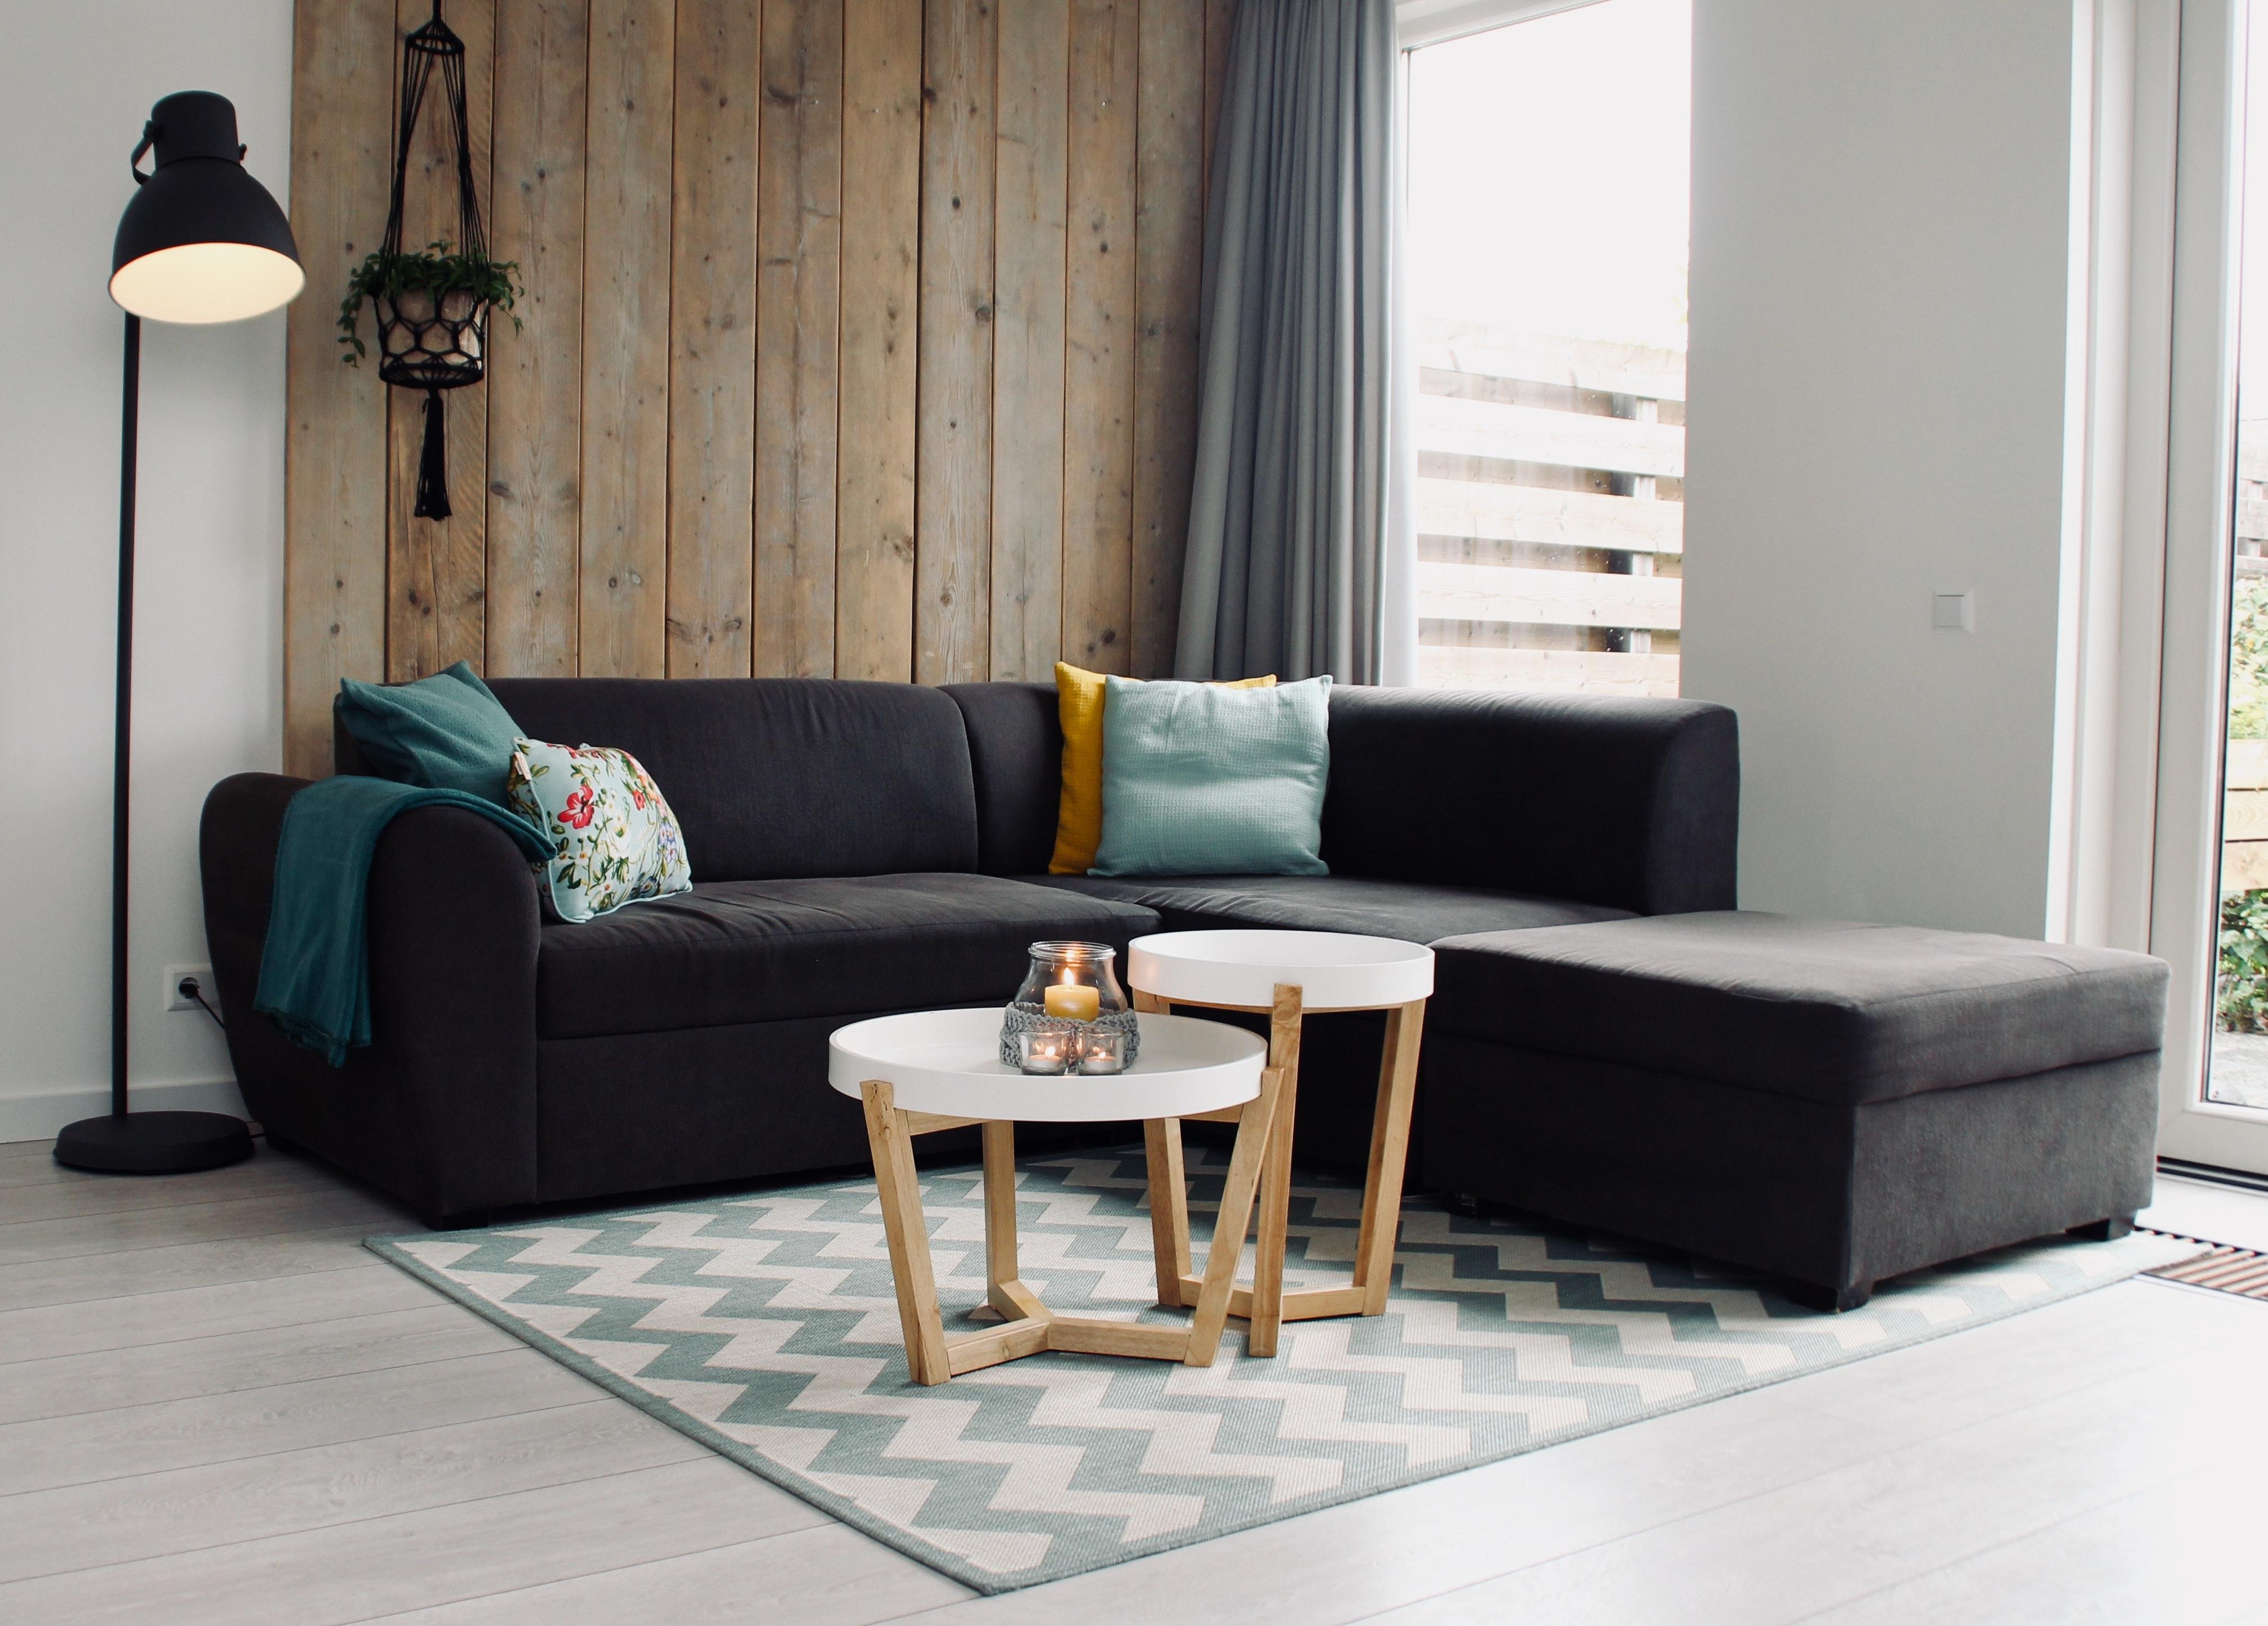 sven brandsma GZ5cKOgeIB0 unsplash - Design din egen drømmesofa